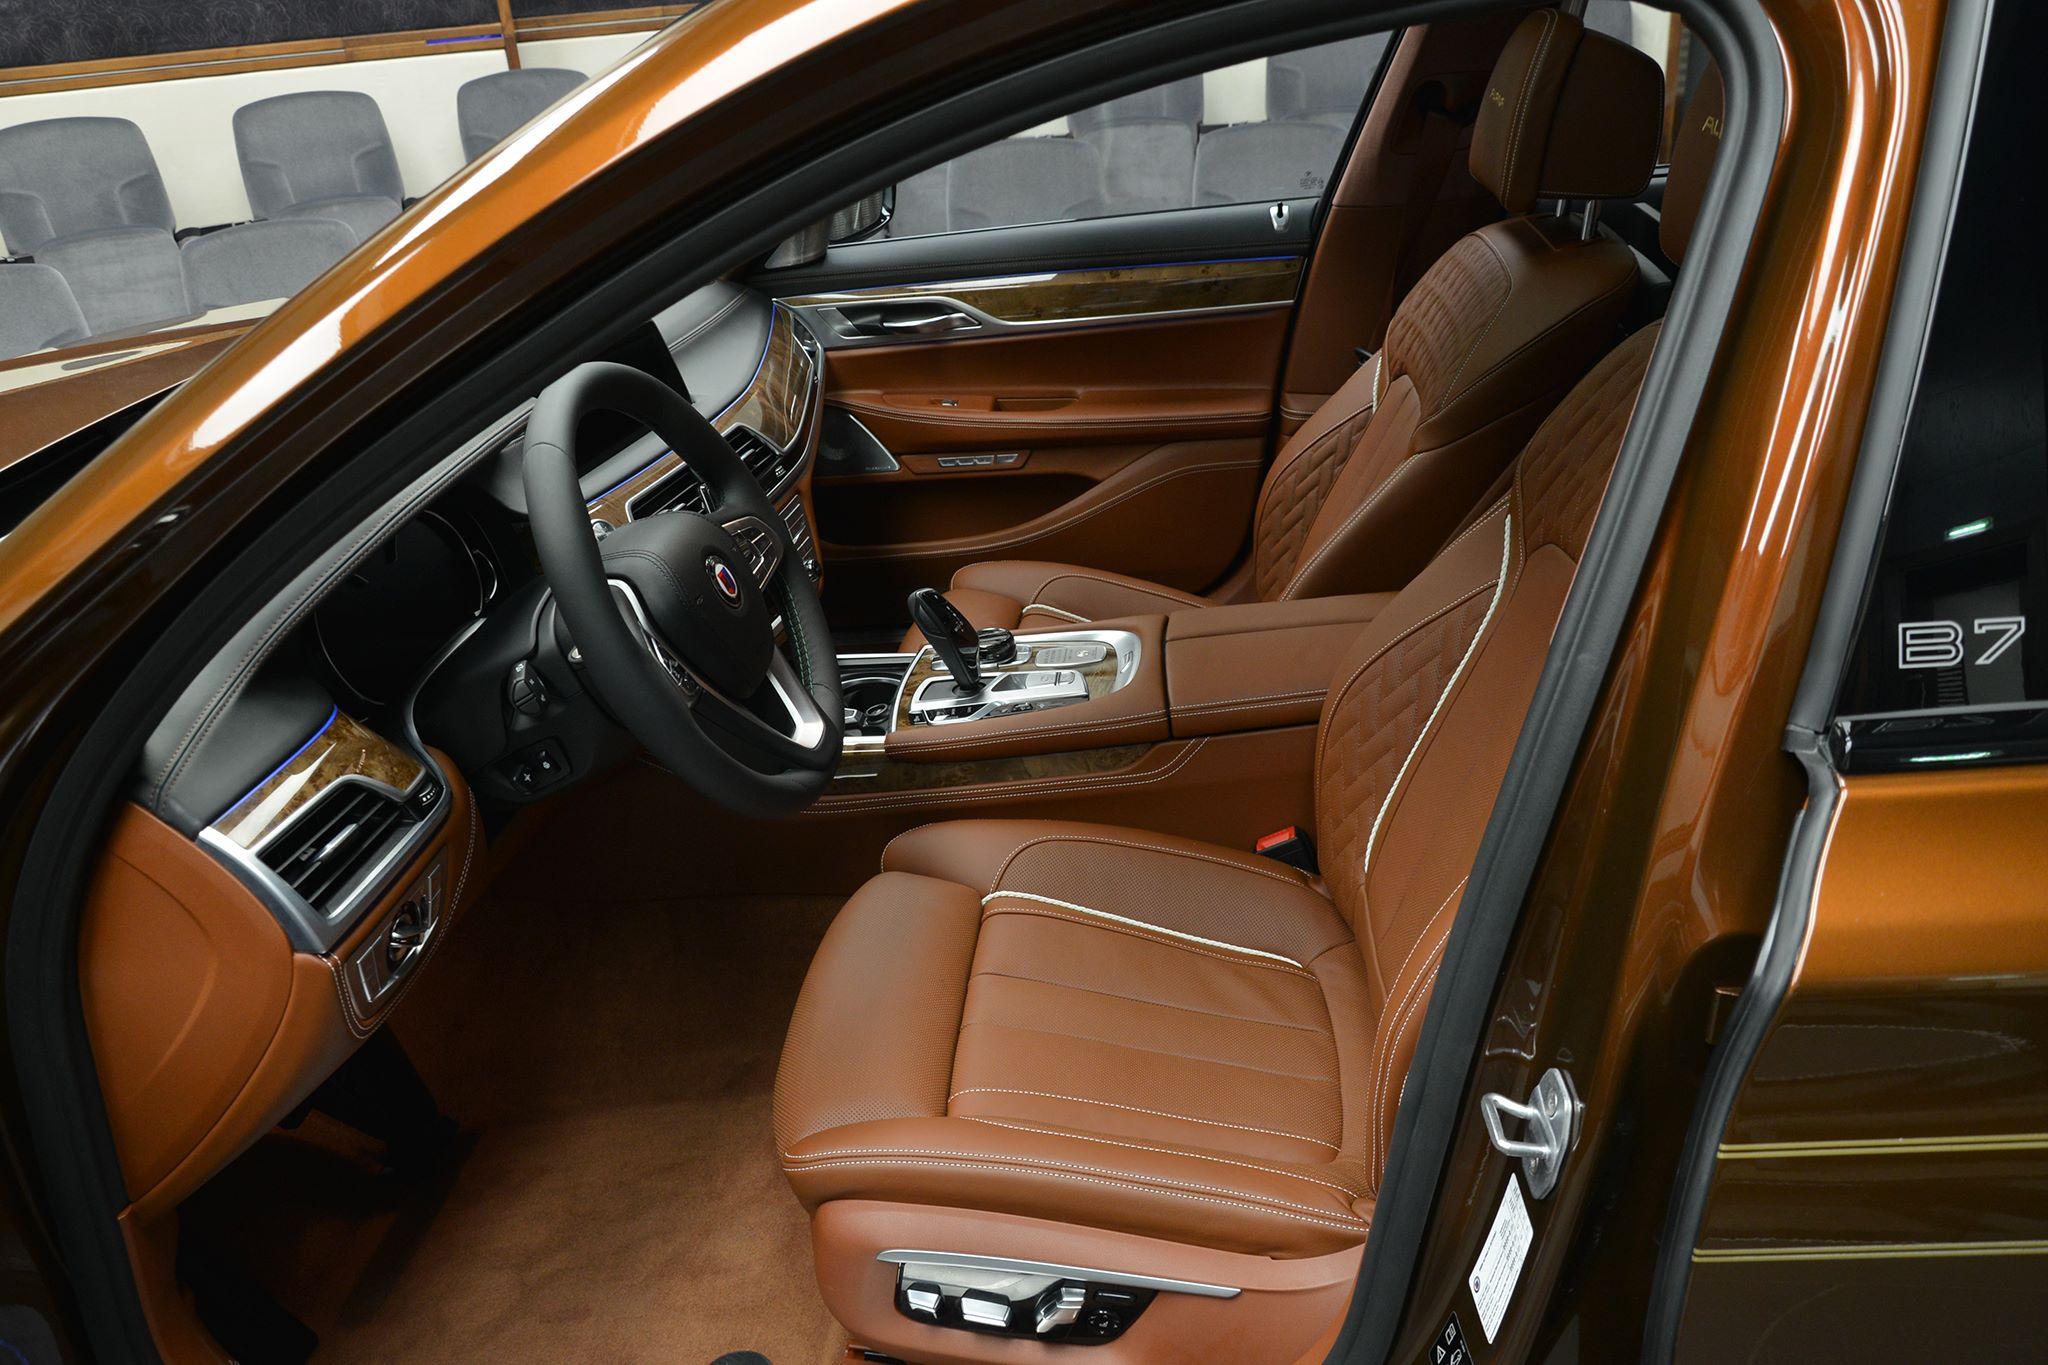 Chestnut Bronze Alpina B7 Bi Turbo Has Matching Brown